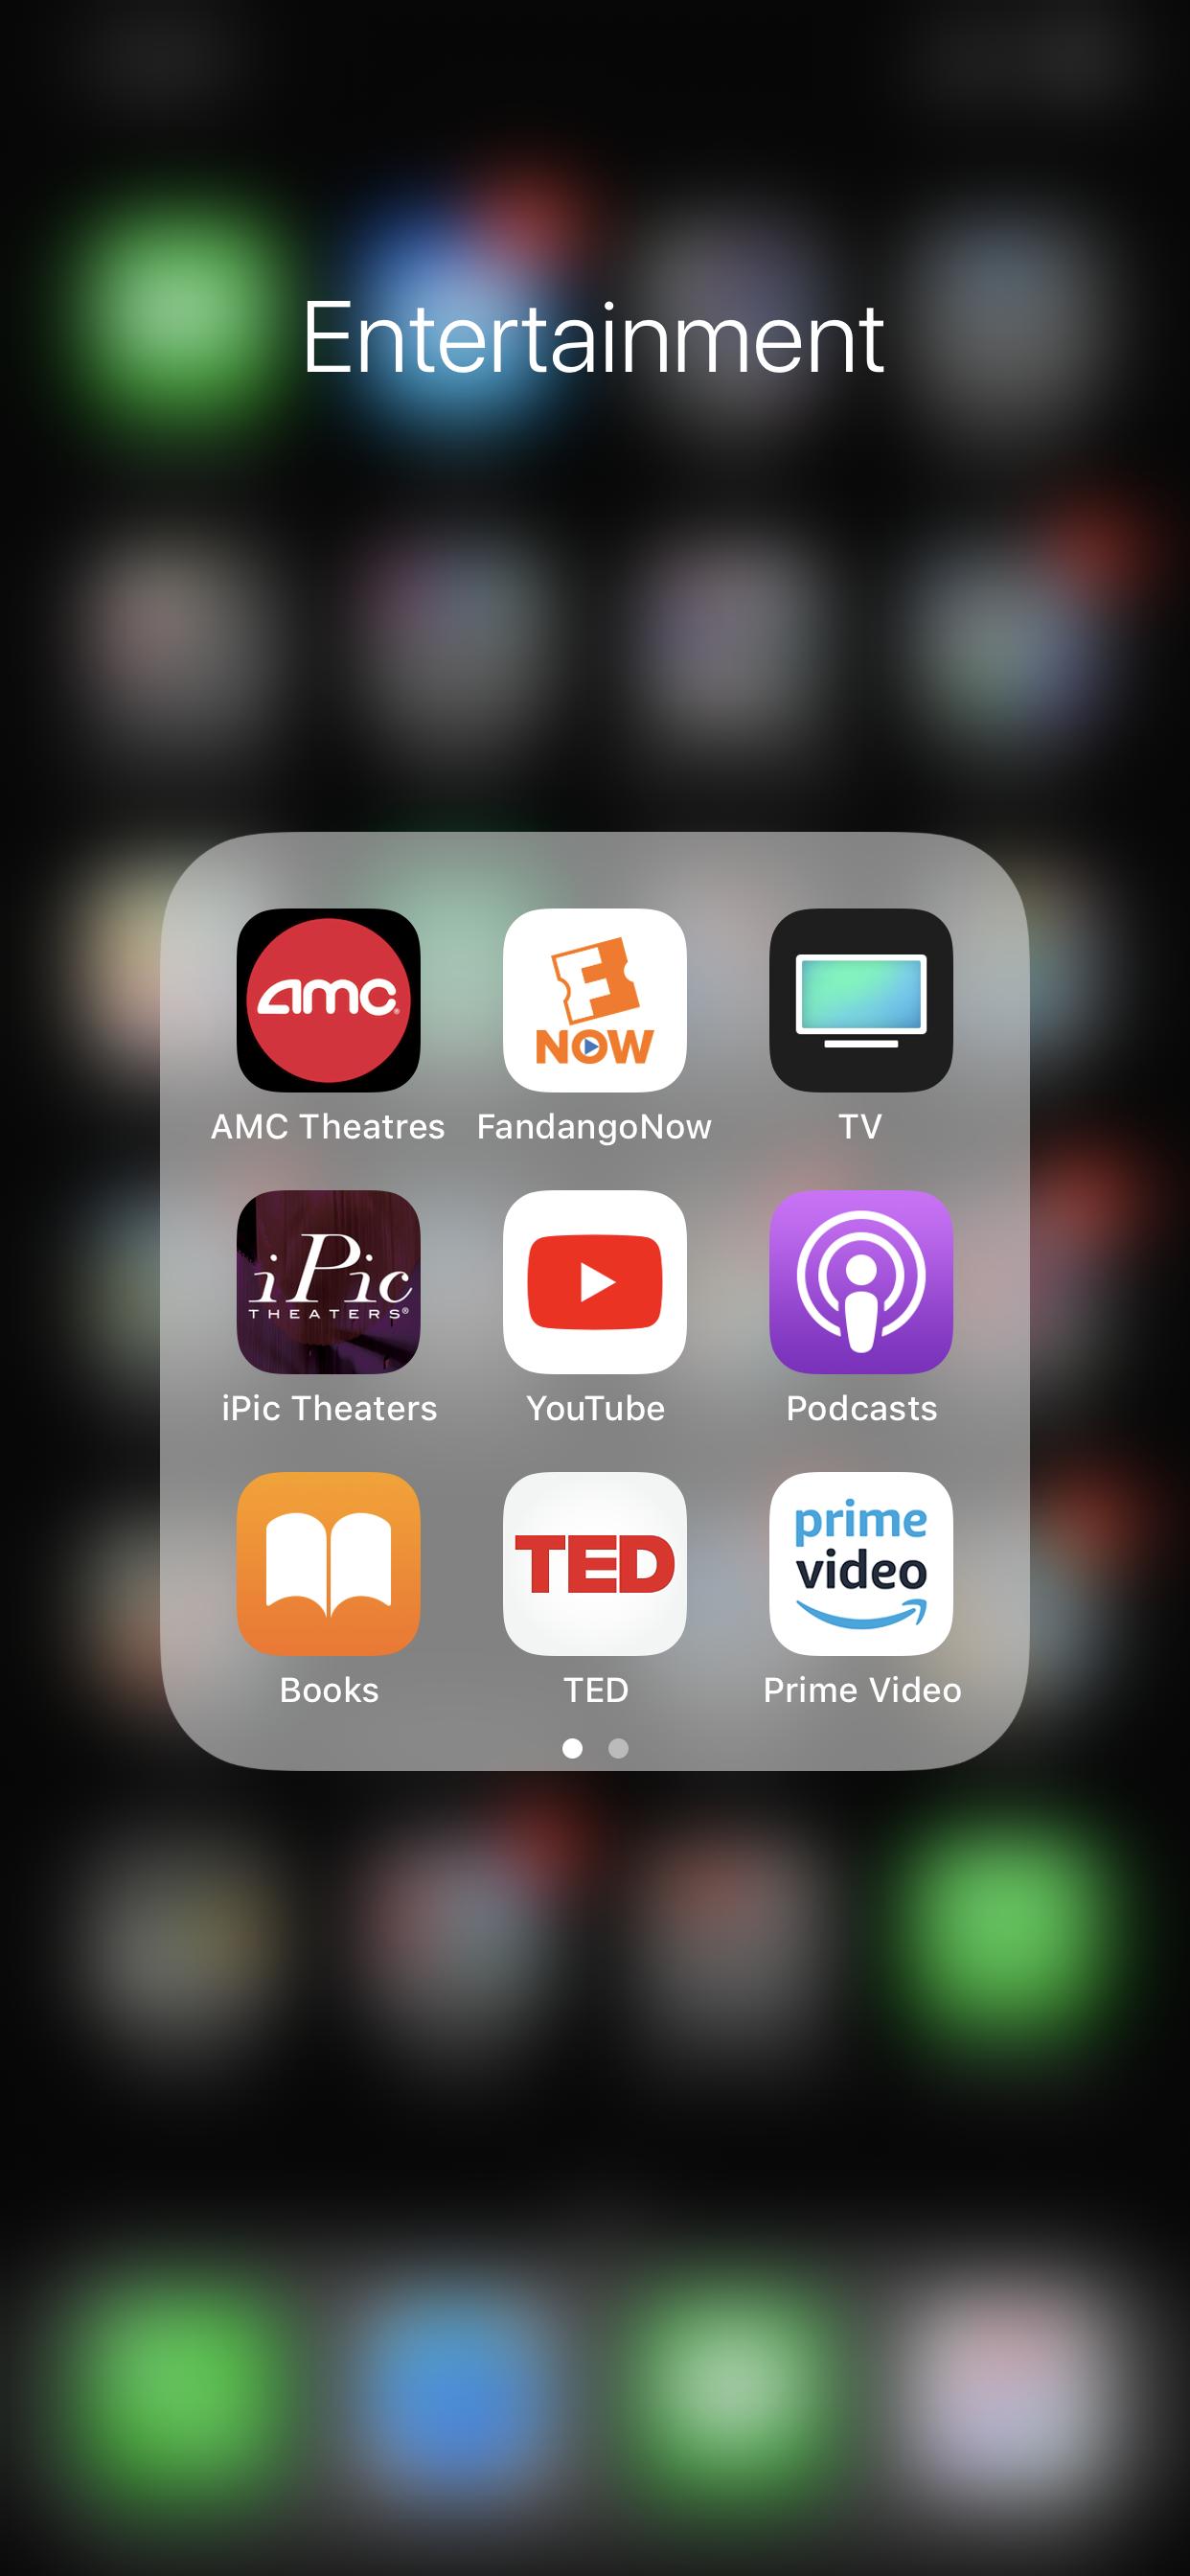 entertainment screenshot 1.png